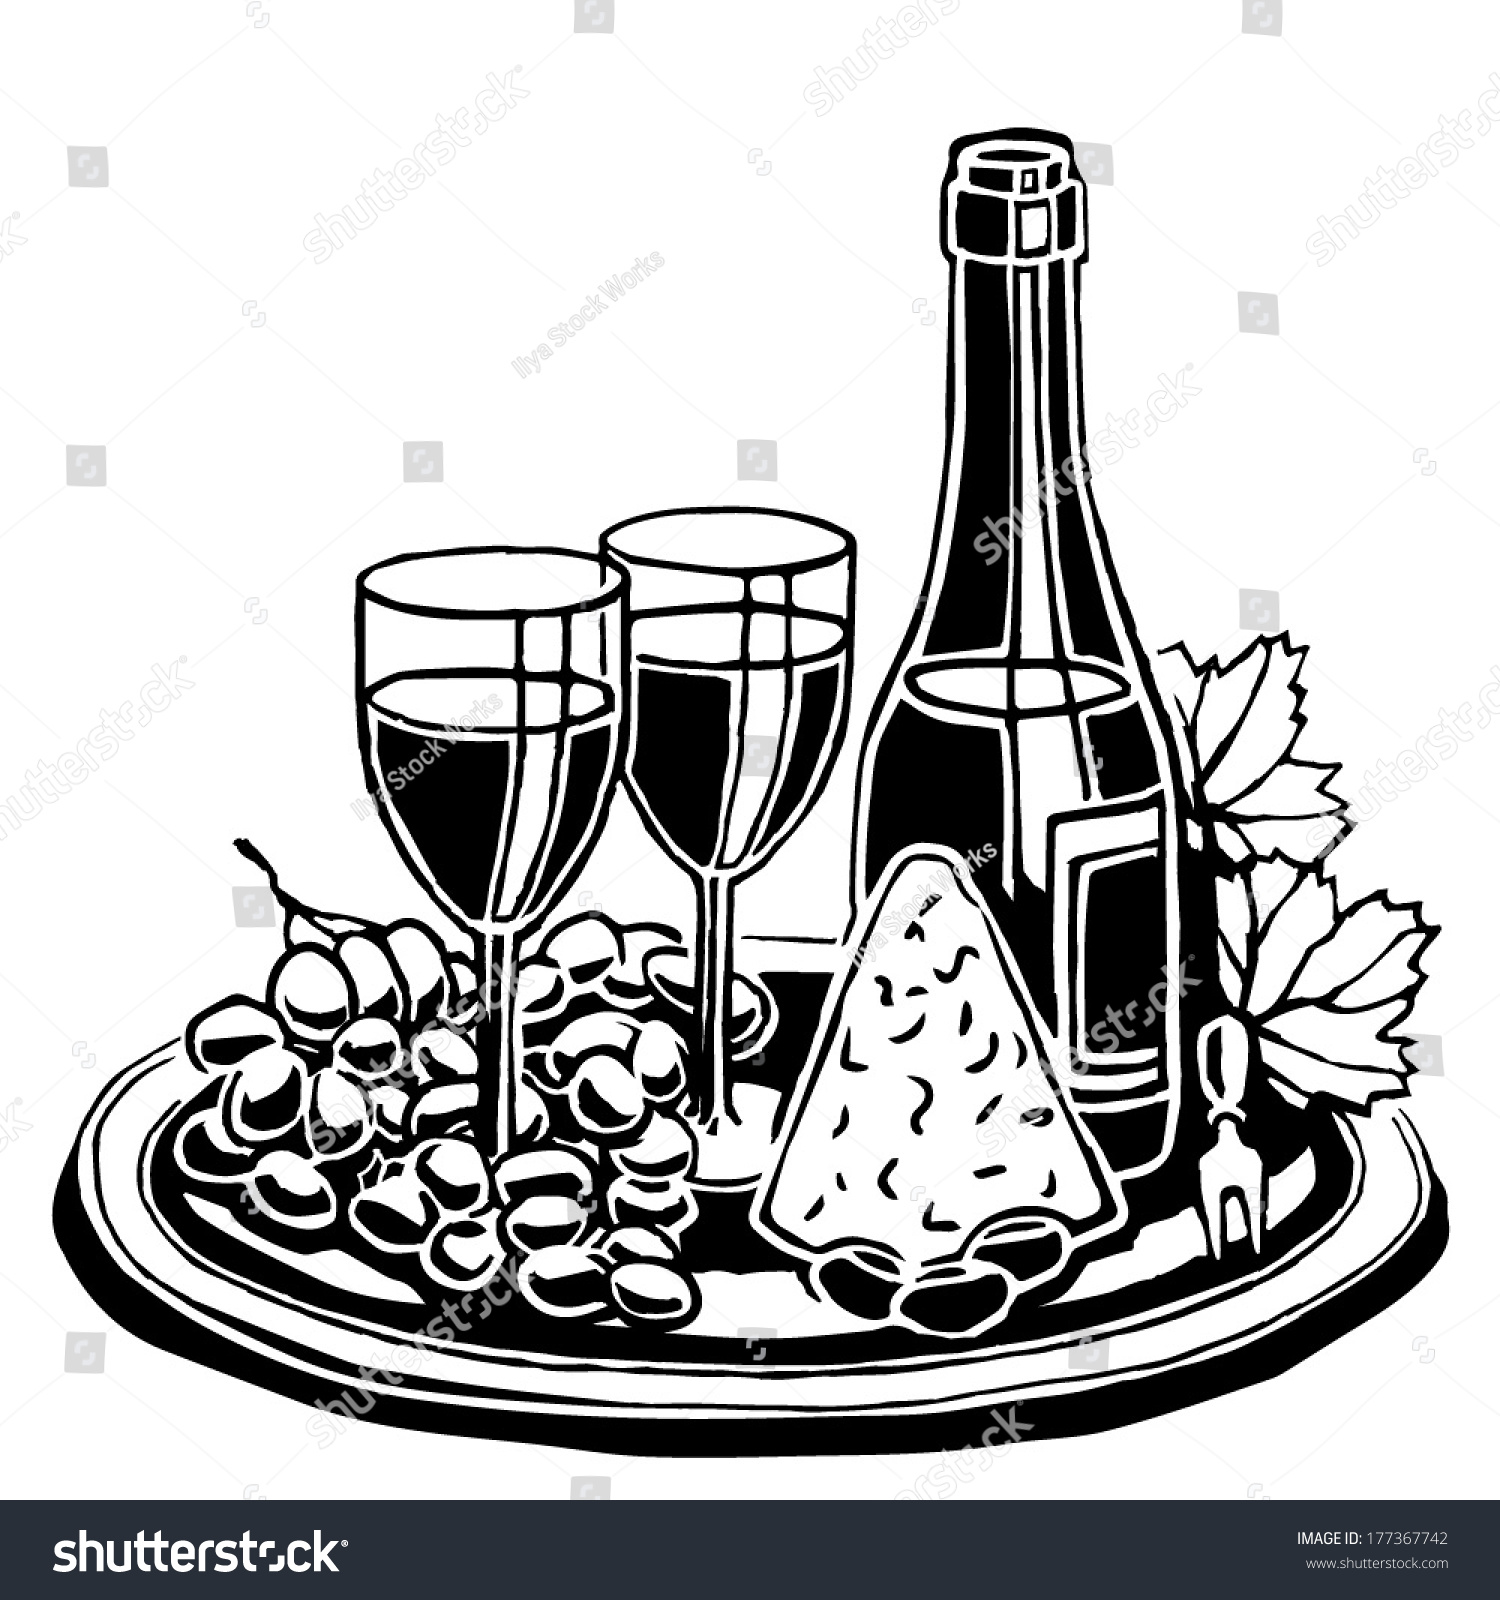 symbolic still life drawing bottle wine stock vector 177367742